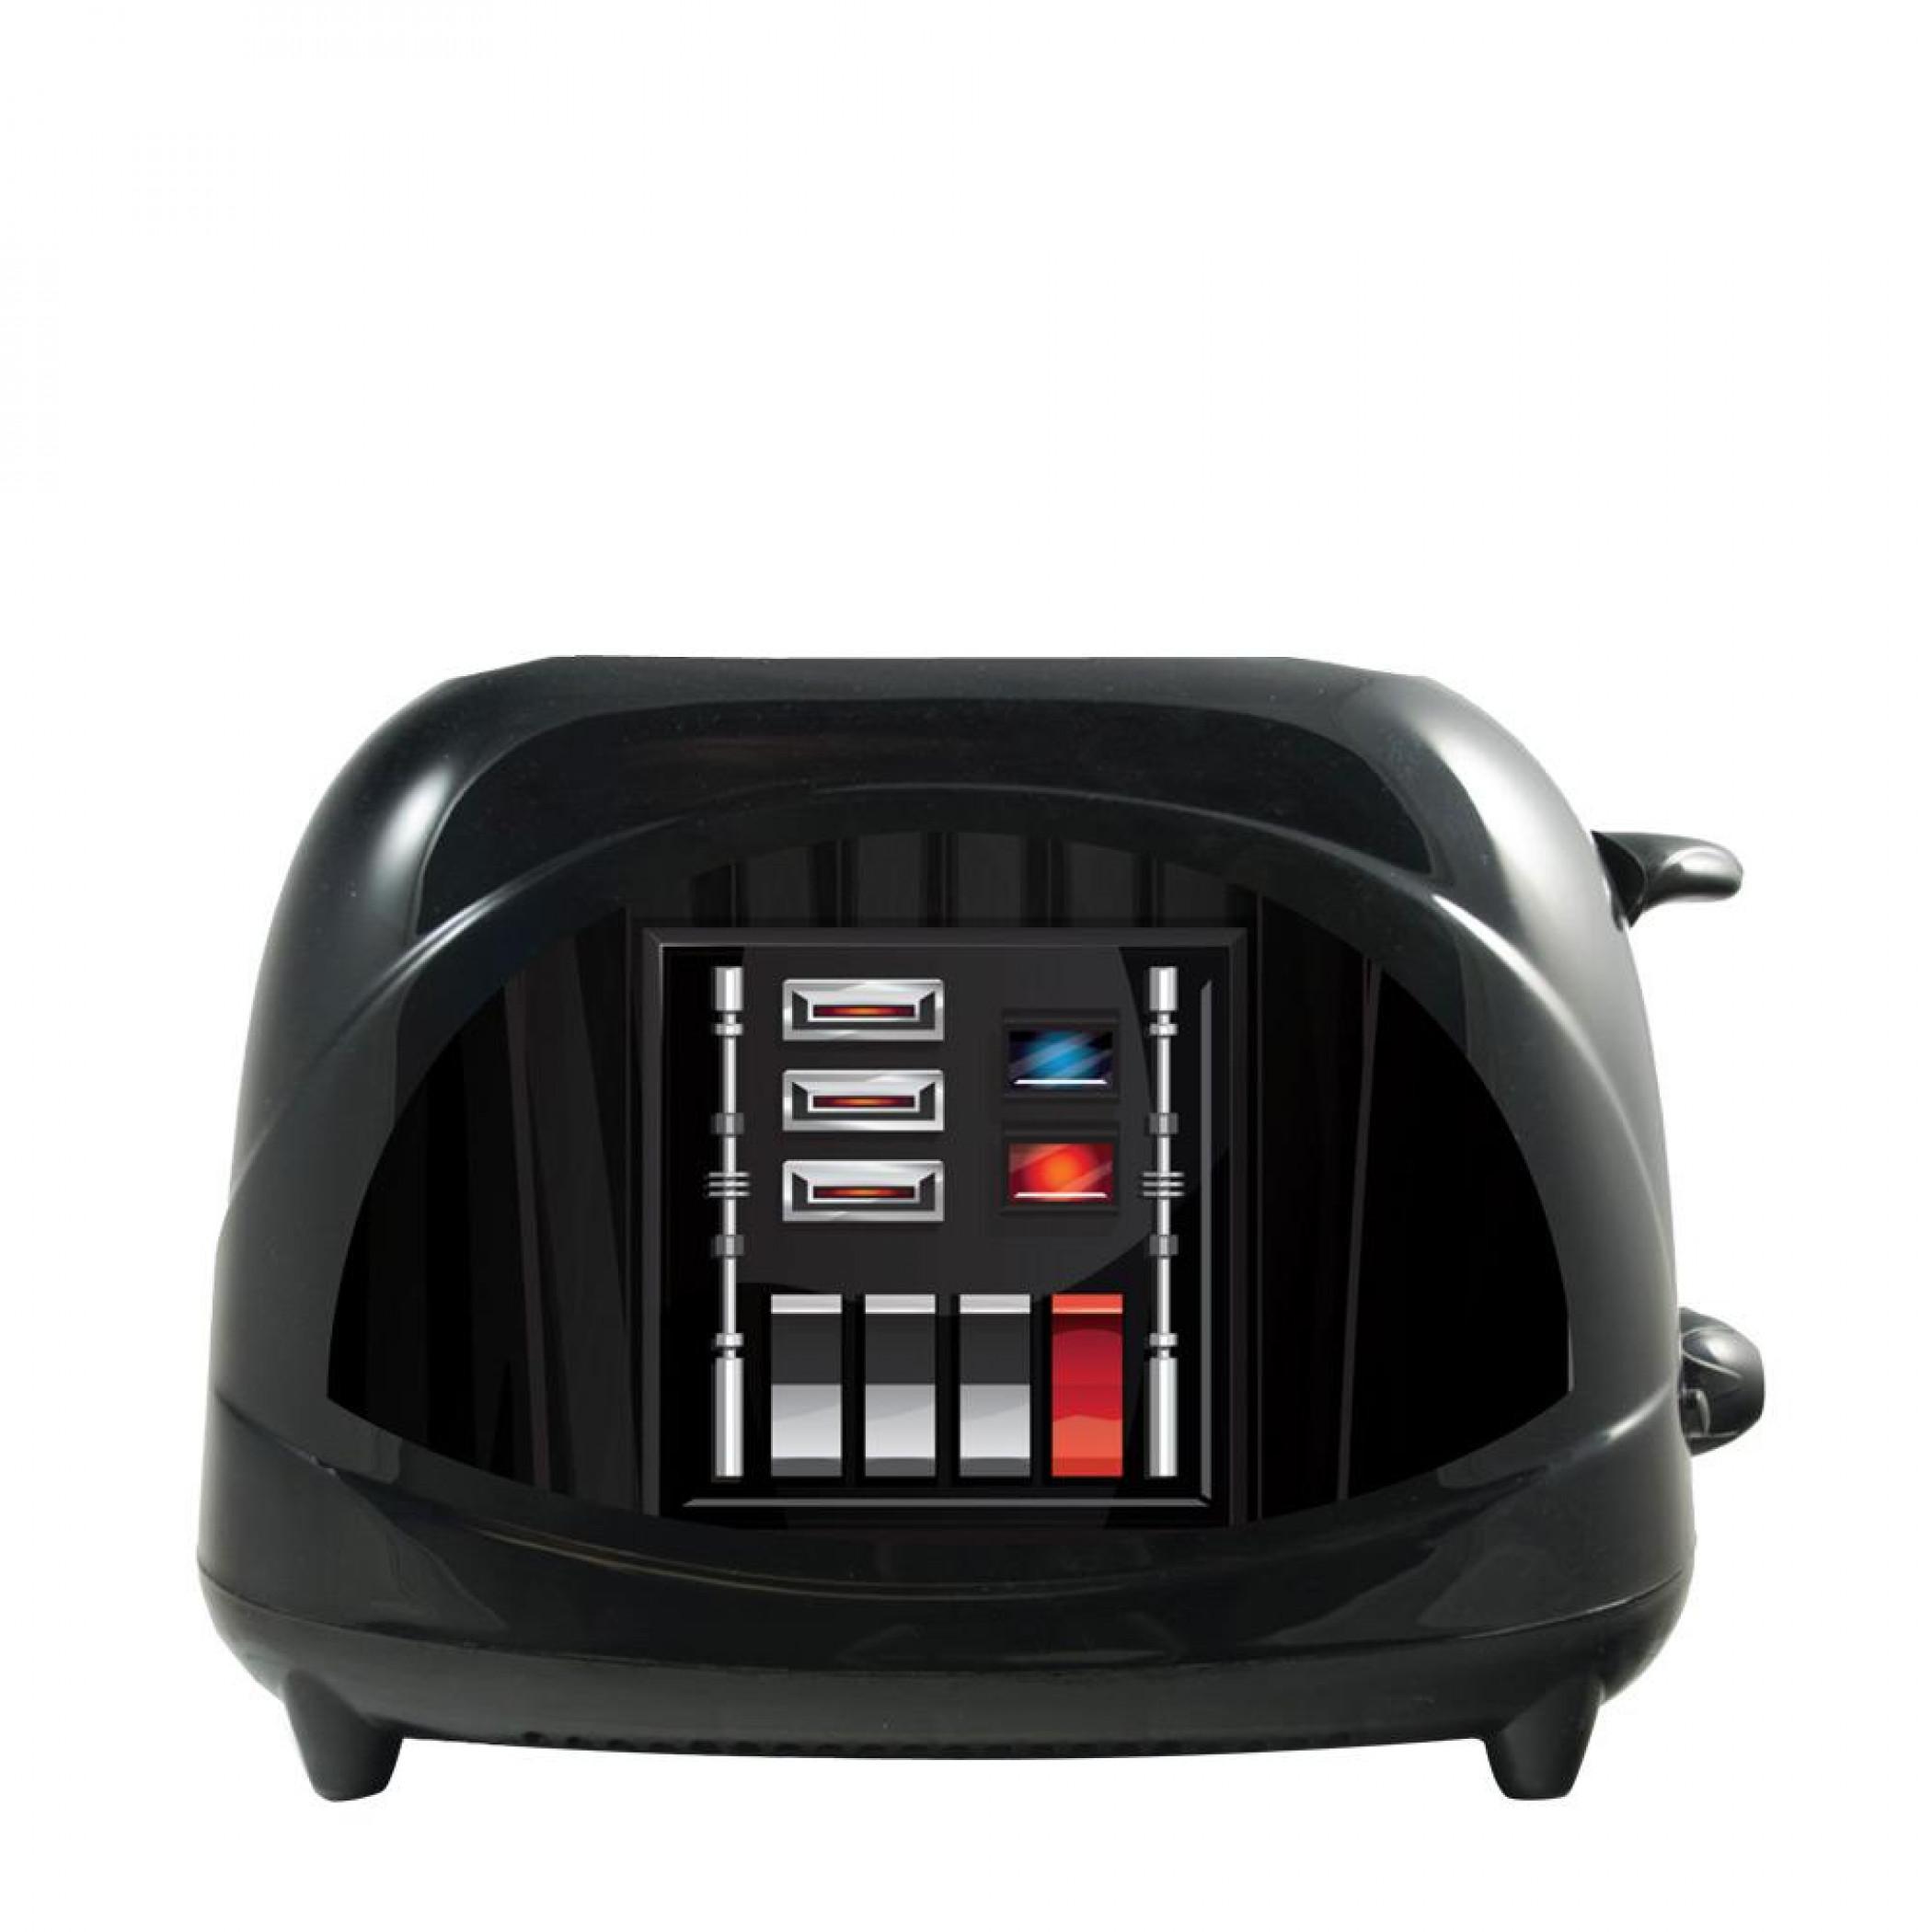 Star Wars Darth Vader Costume Elite Toaster